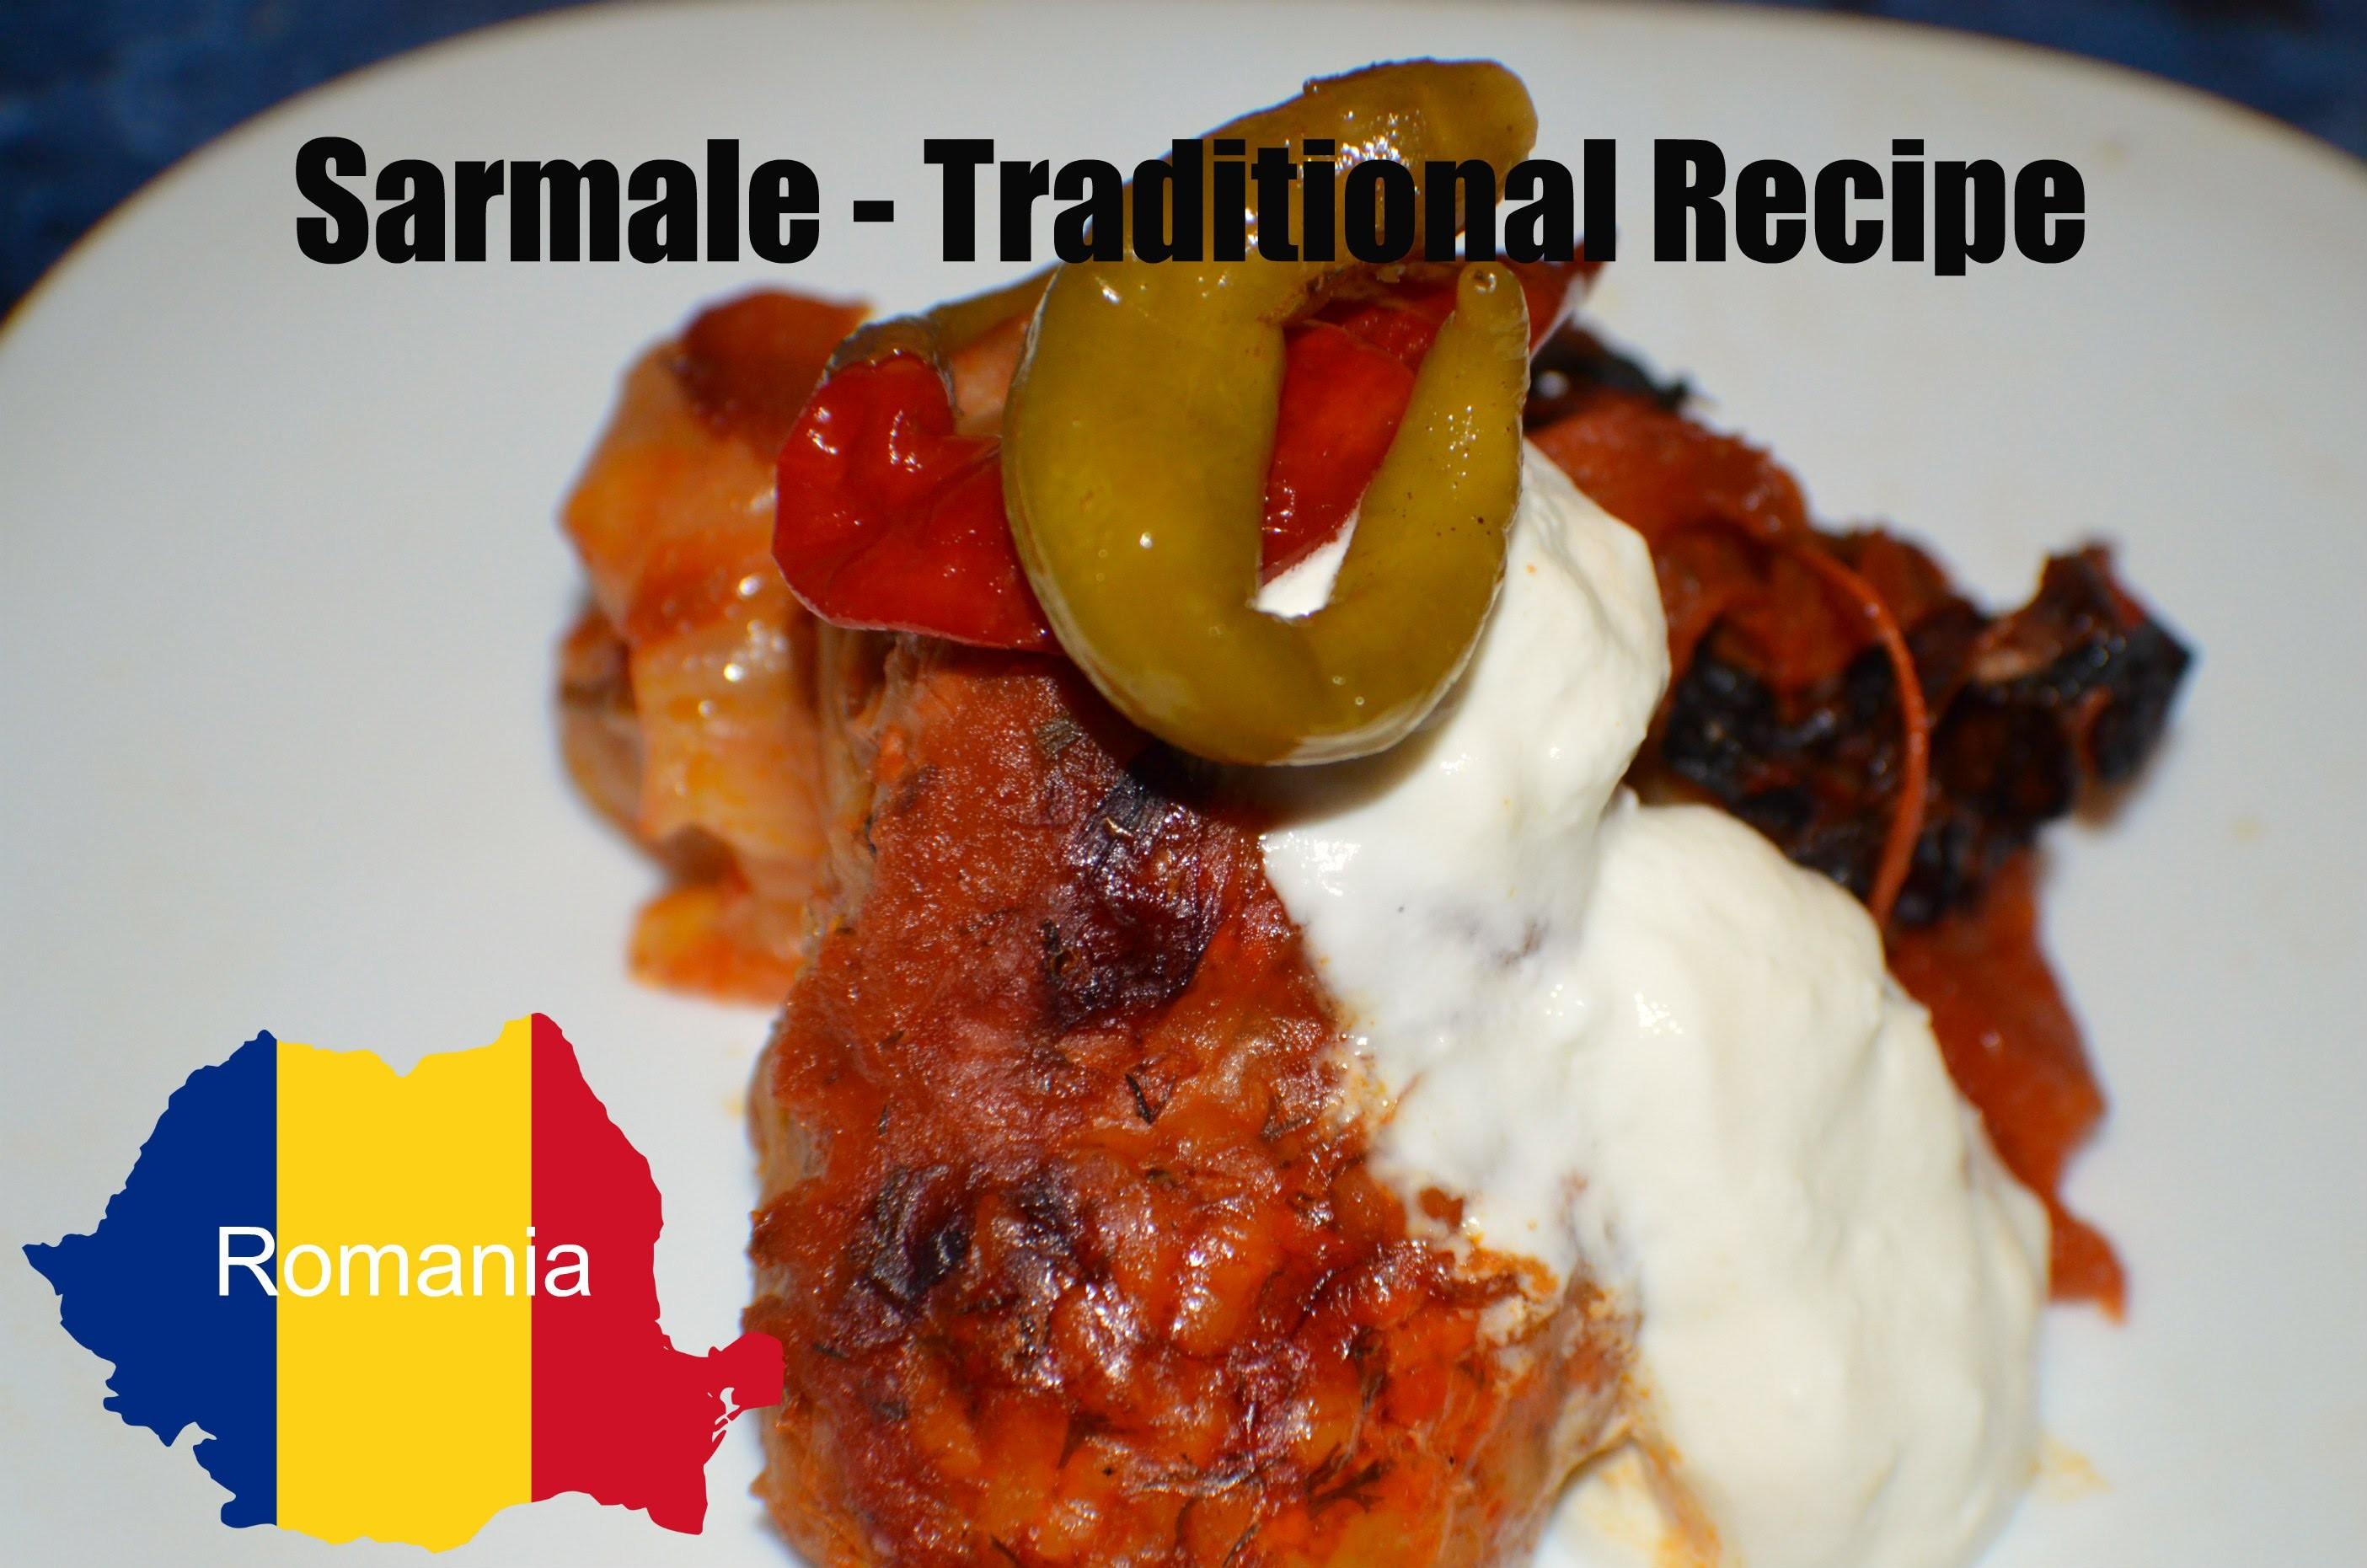 - How to make- Traditional Romanian Sarma